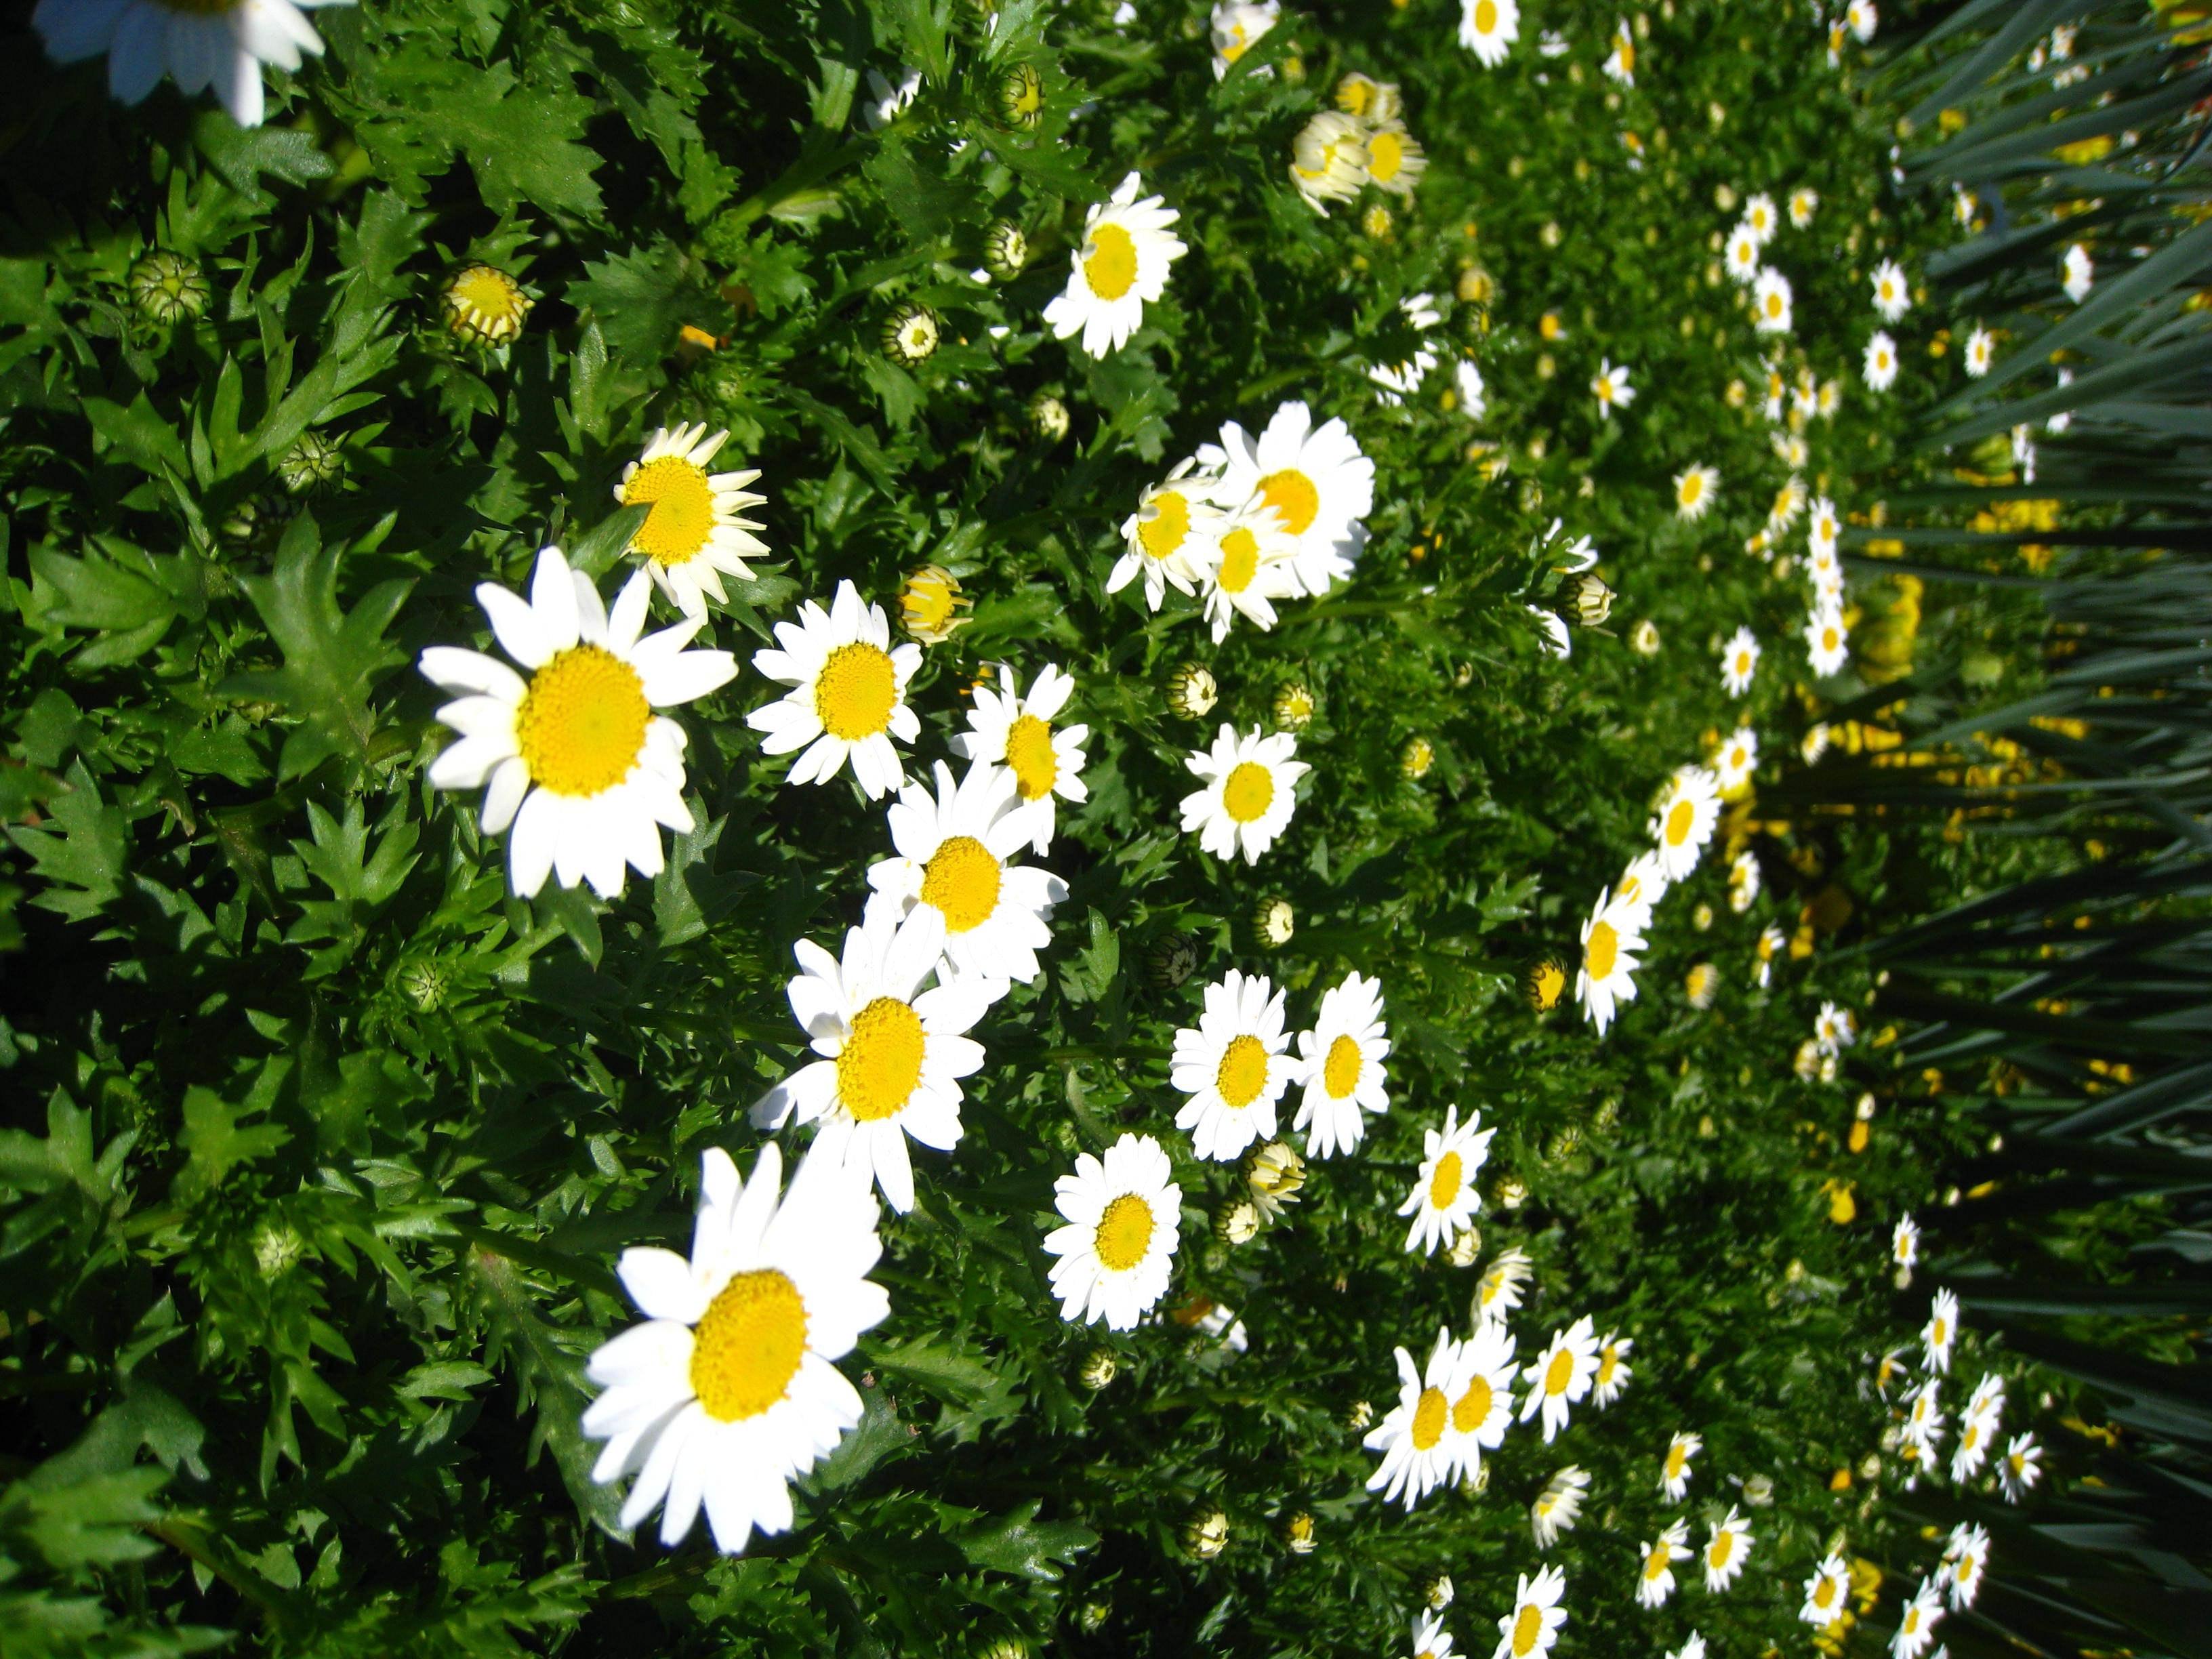 Free stock photo of beautiful flowers beauty daisies free download izmirmasajfo